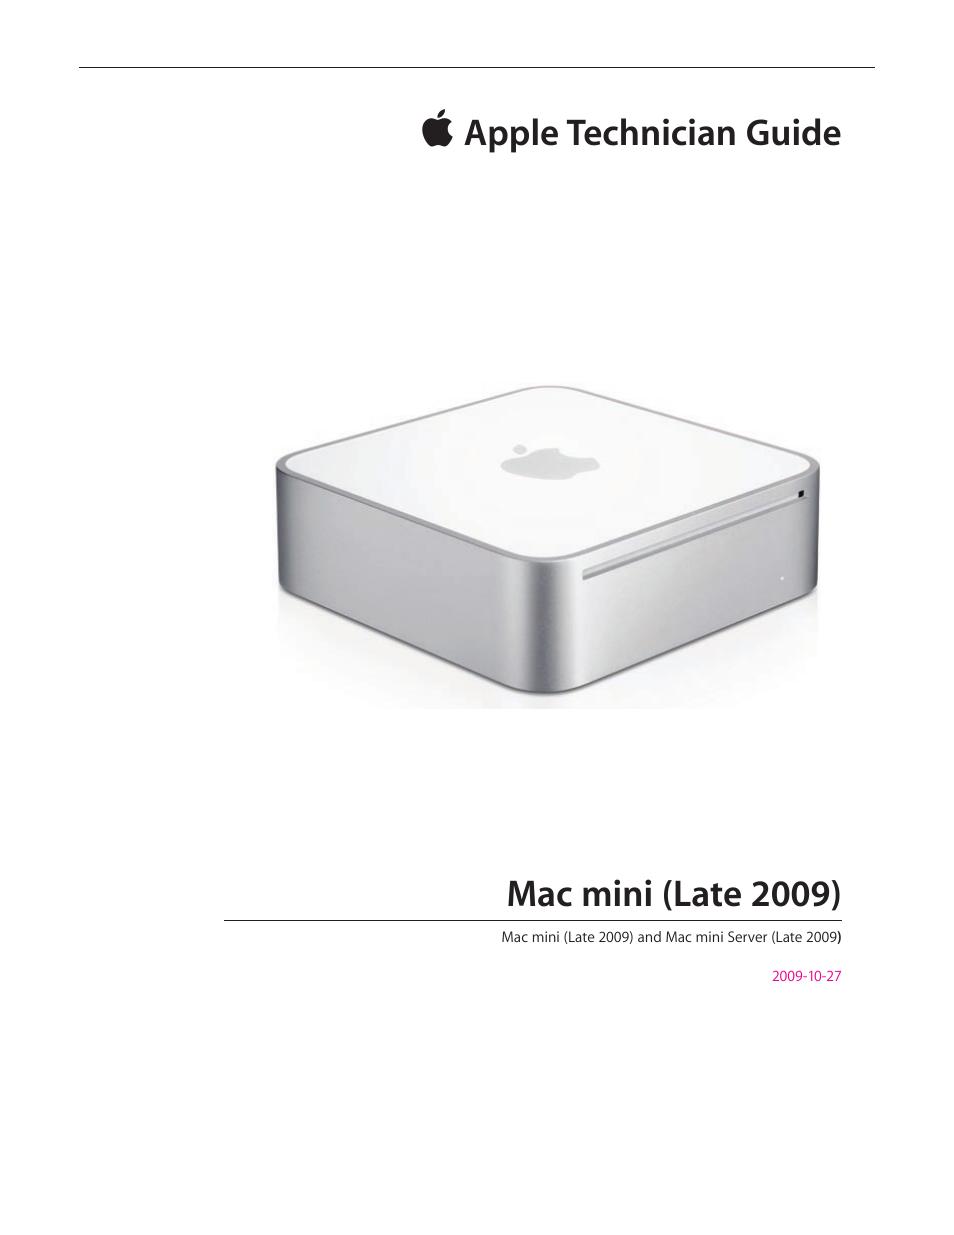 apple mac mini late 2009 technician guide user manual 148 pages rh manualsdir com mac mini server configuration mac mini server vpn configuration